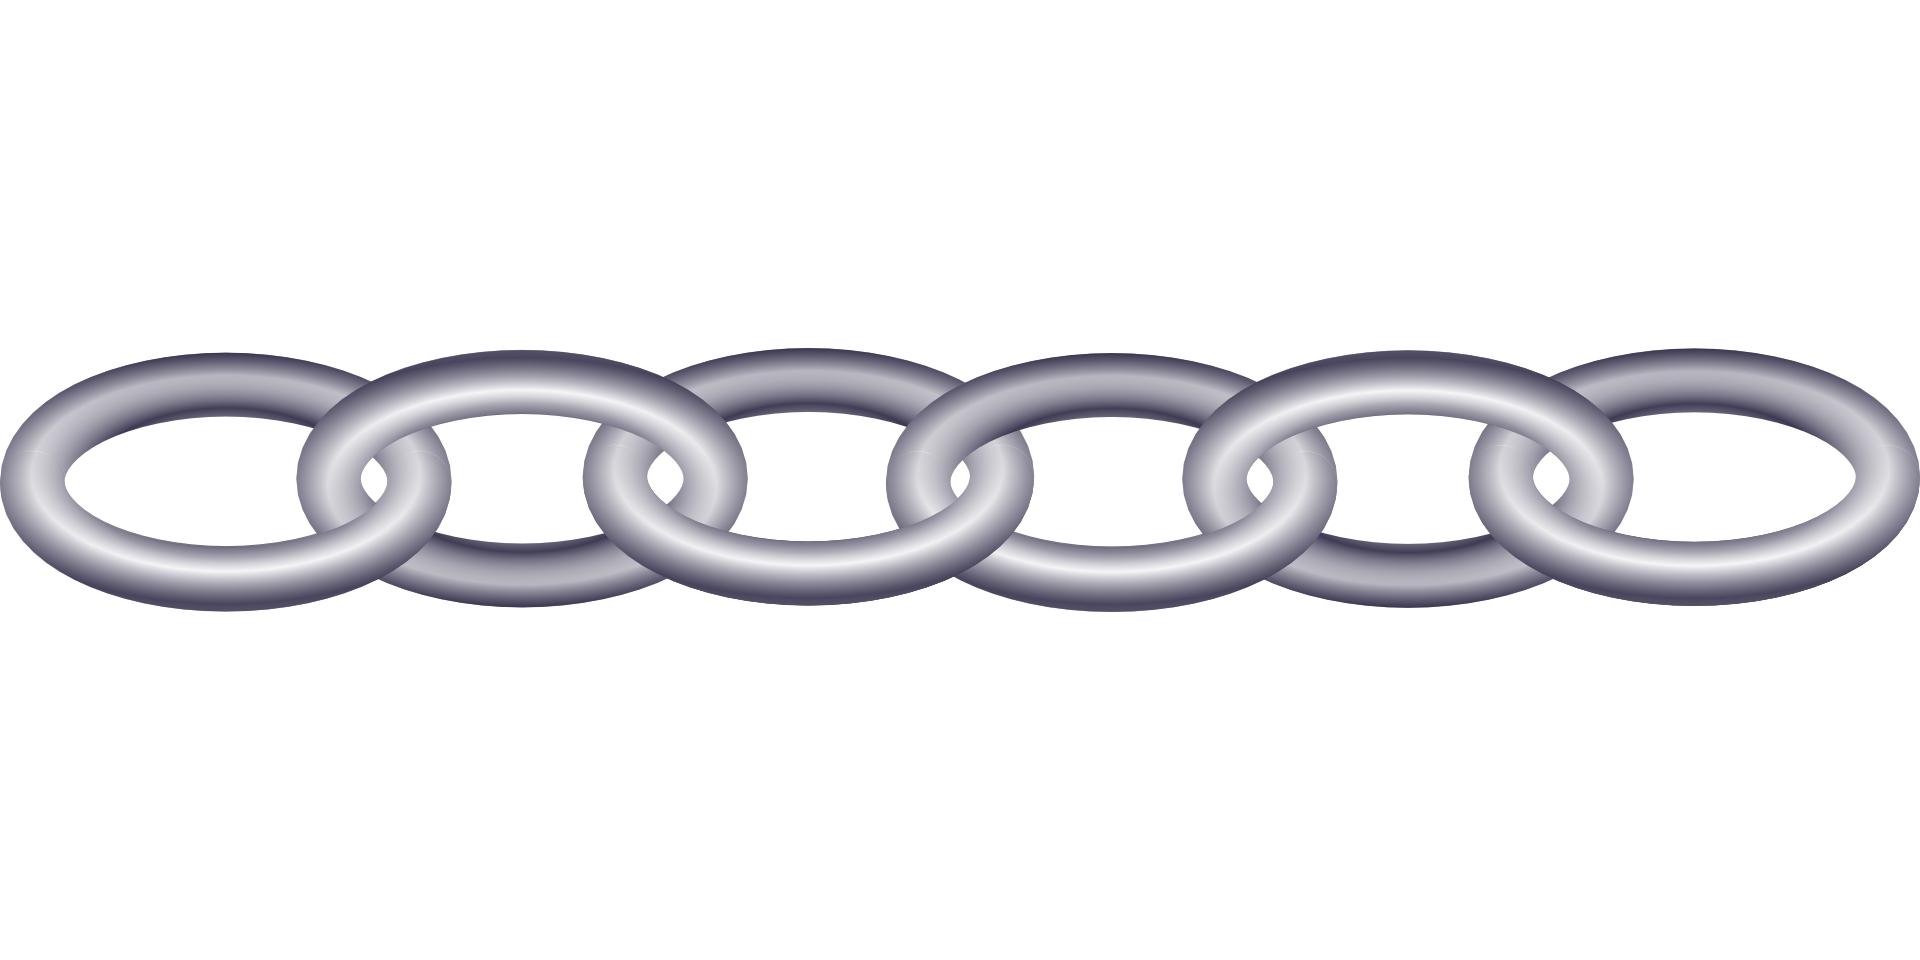 Free download clip art. Chain clipart vector